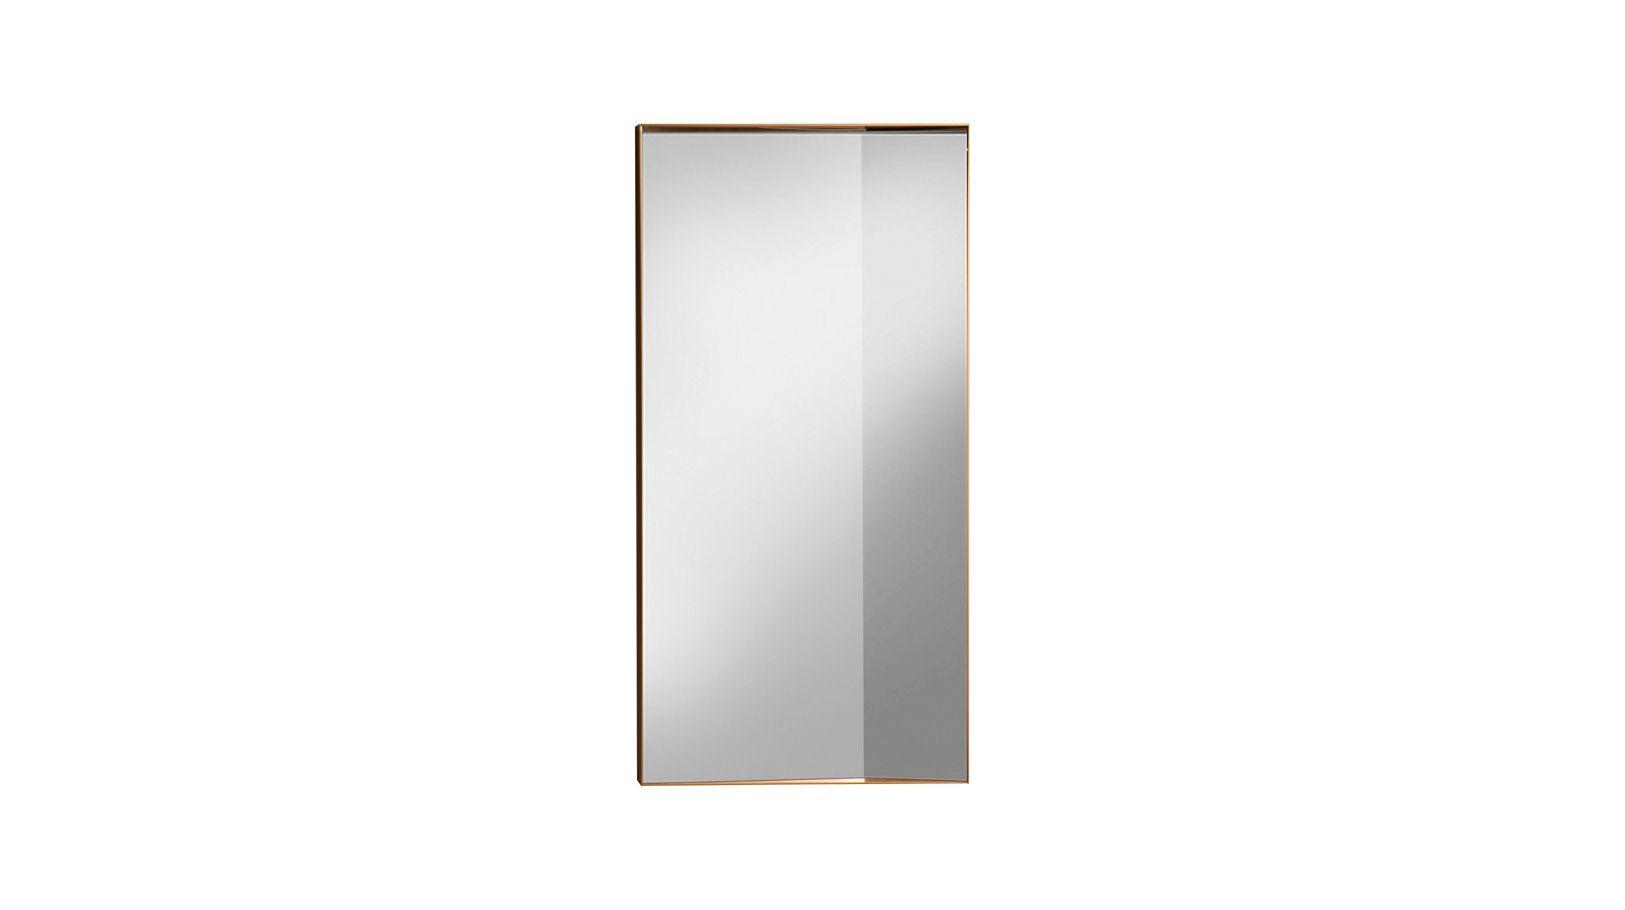 Miroir simple angle roche bobois for Miroir simple